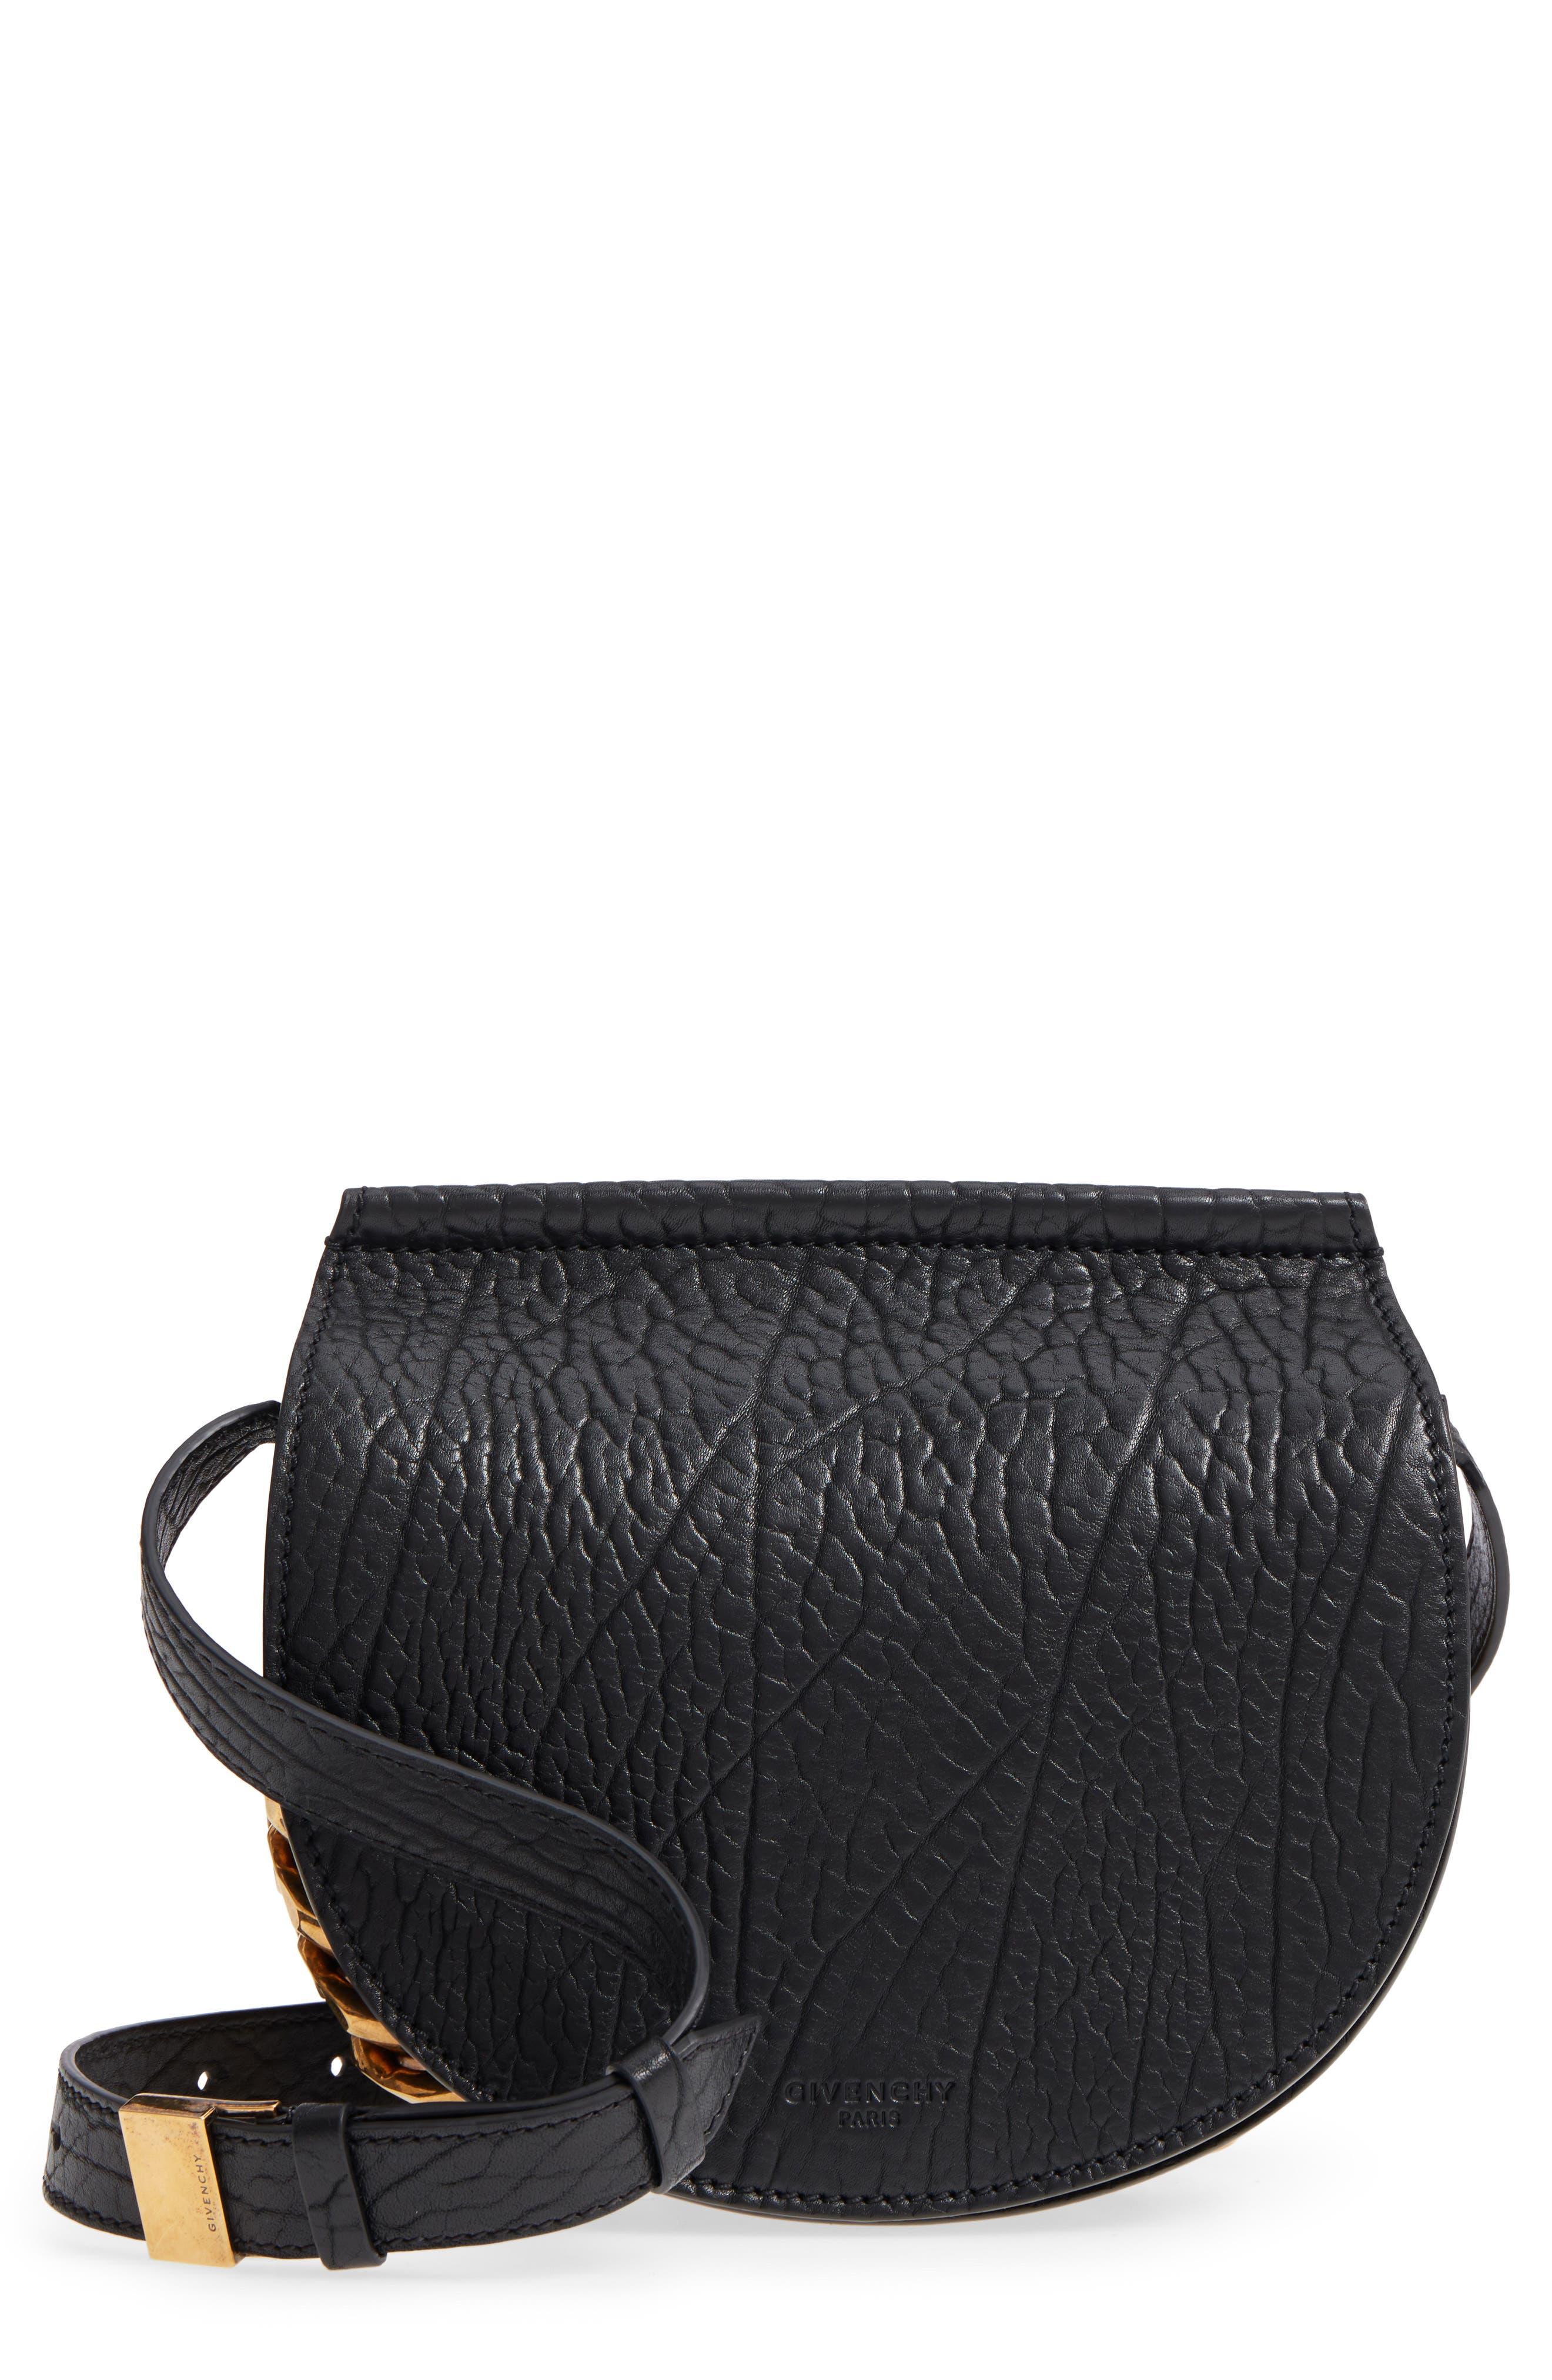 Infinity Calfskin Leather Saddle Bag,                             Main thumbnail 1, color,                             001